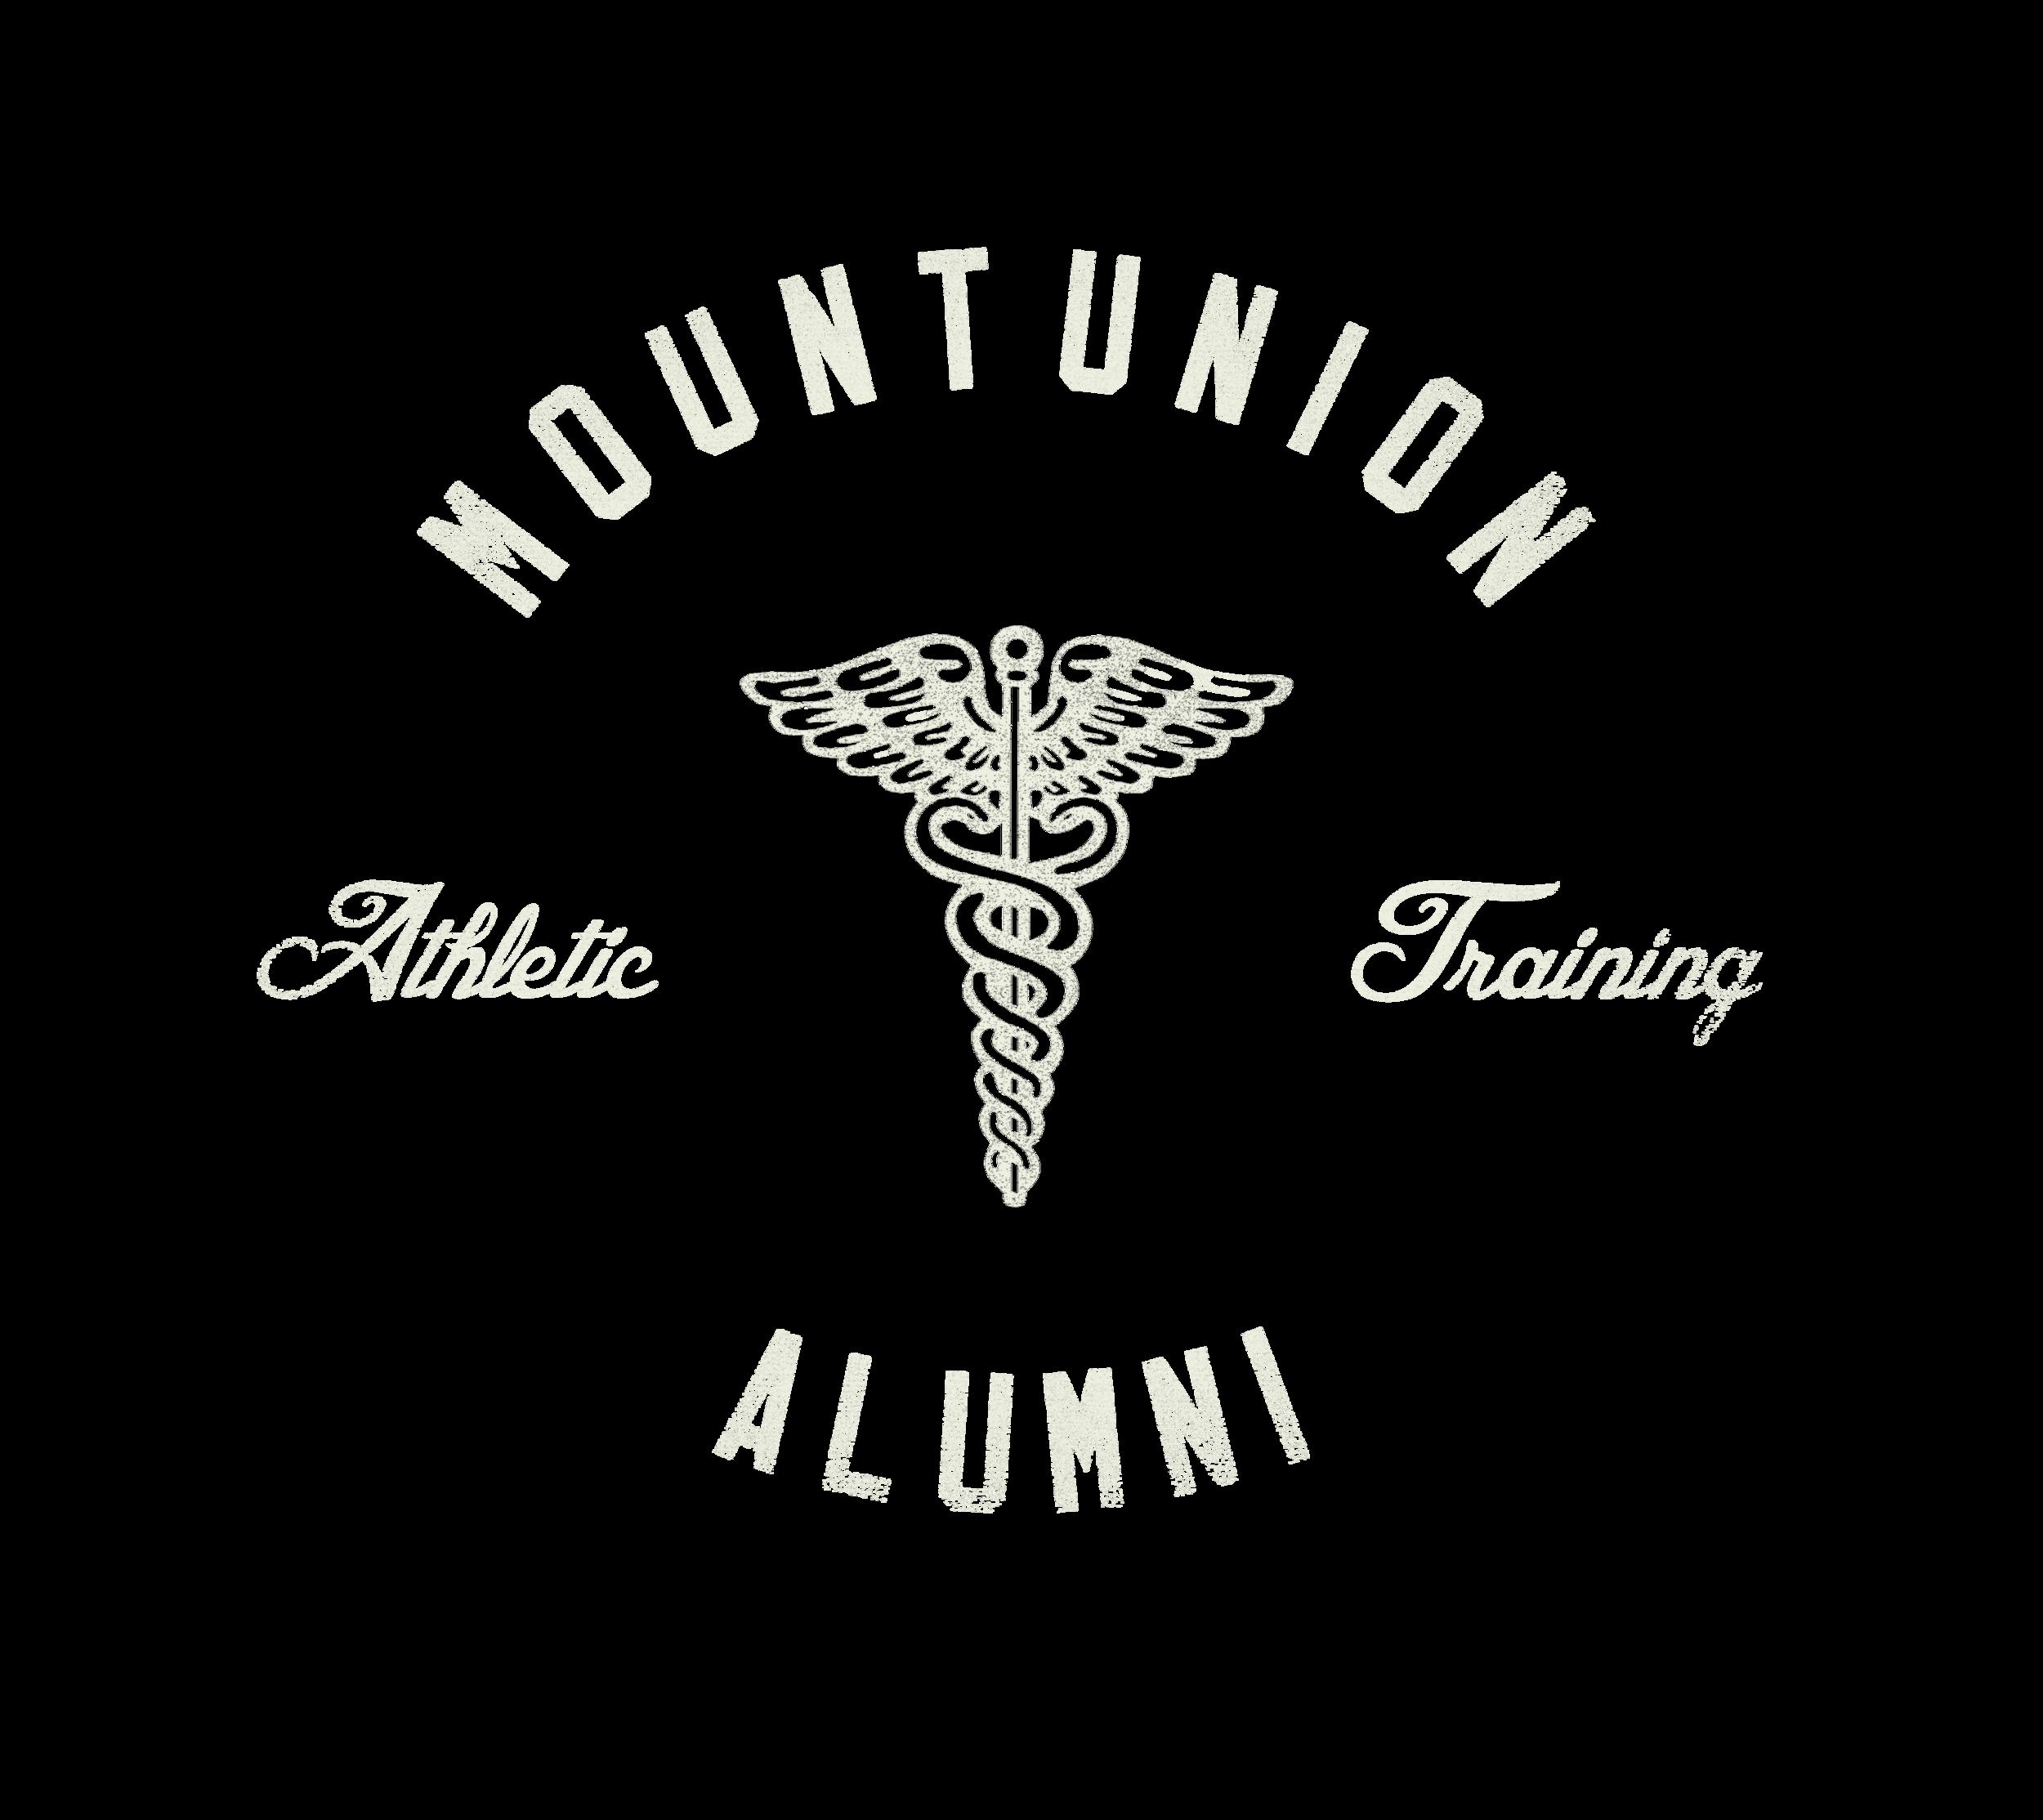 Mount Union Athletic Training Alumni 17 flat.png